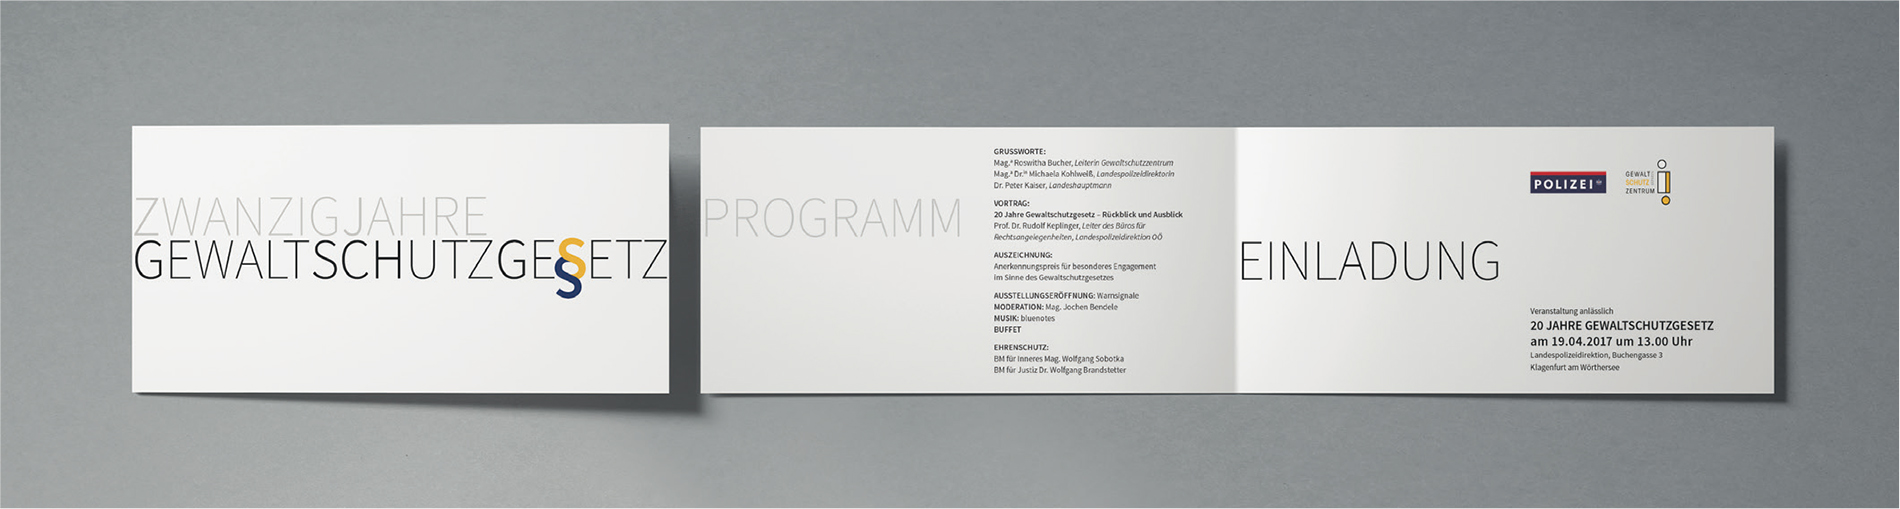 BOSS Grafik | Gewaltschutzzentrum Kärnten